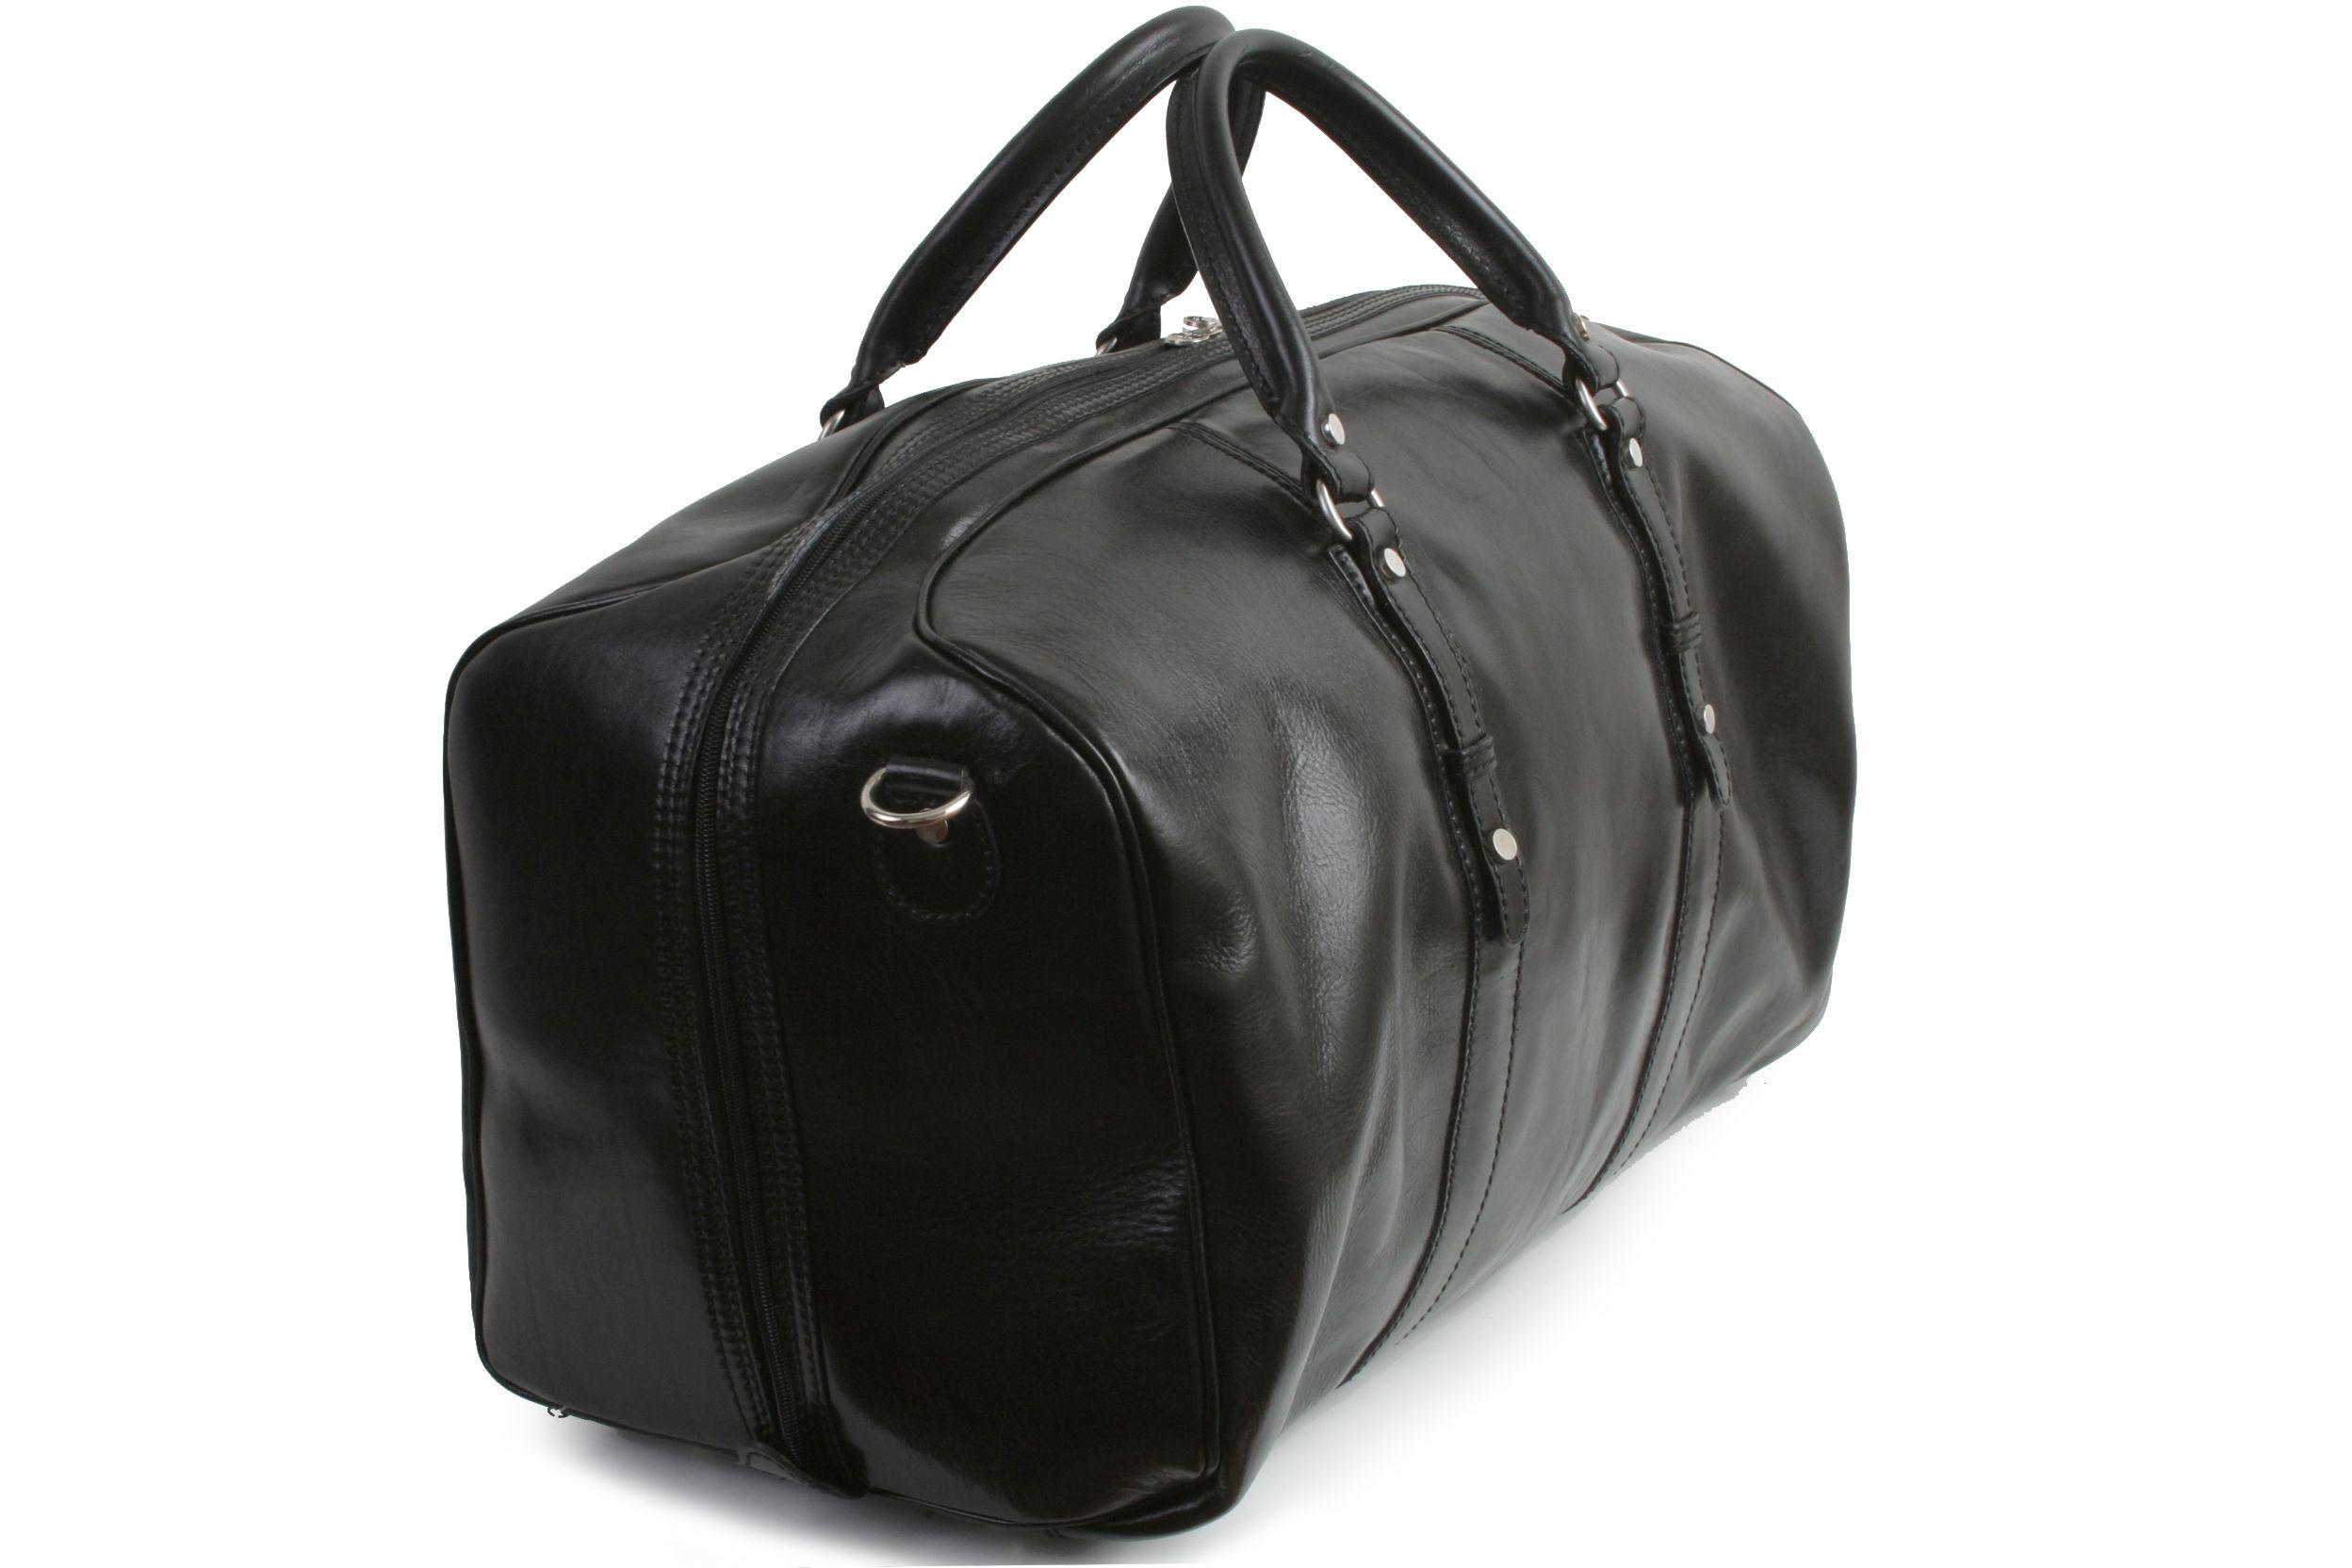 da05389c0a Marco Polo Black leather travel bag - hardtofind.